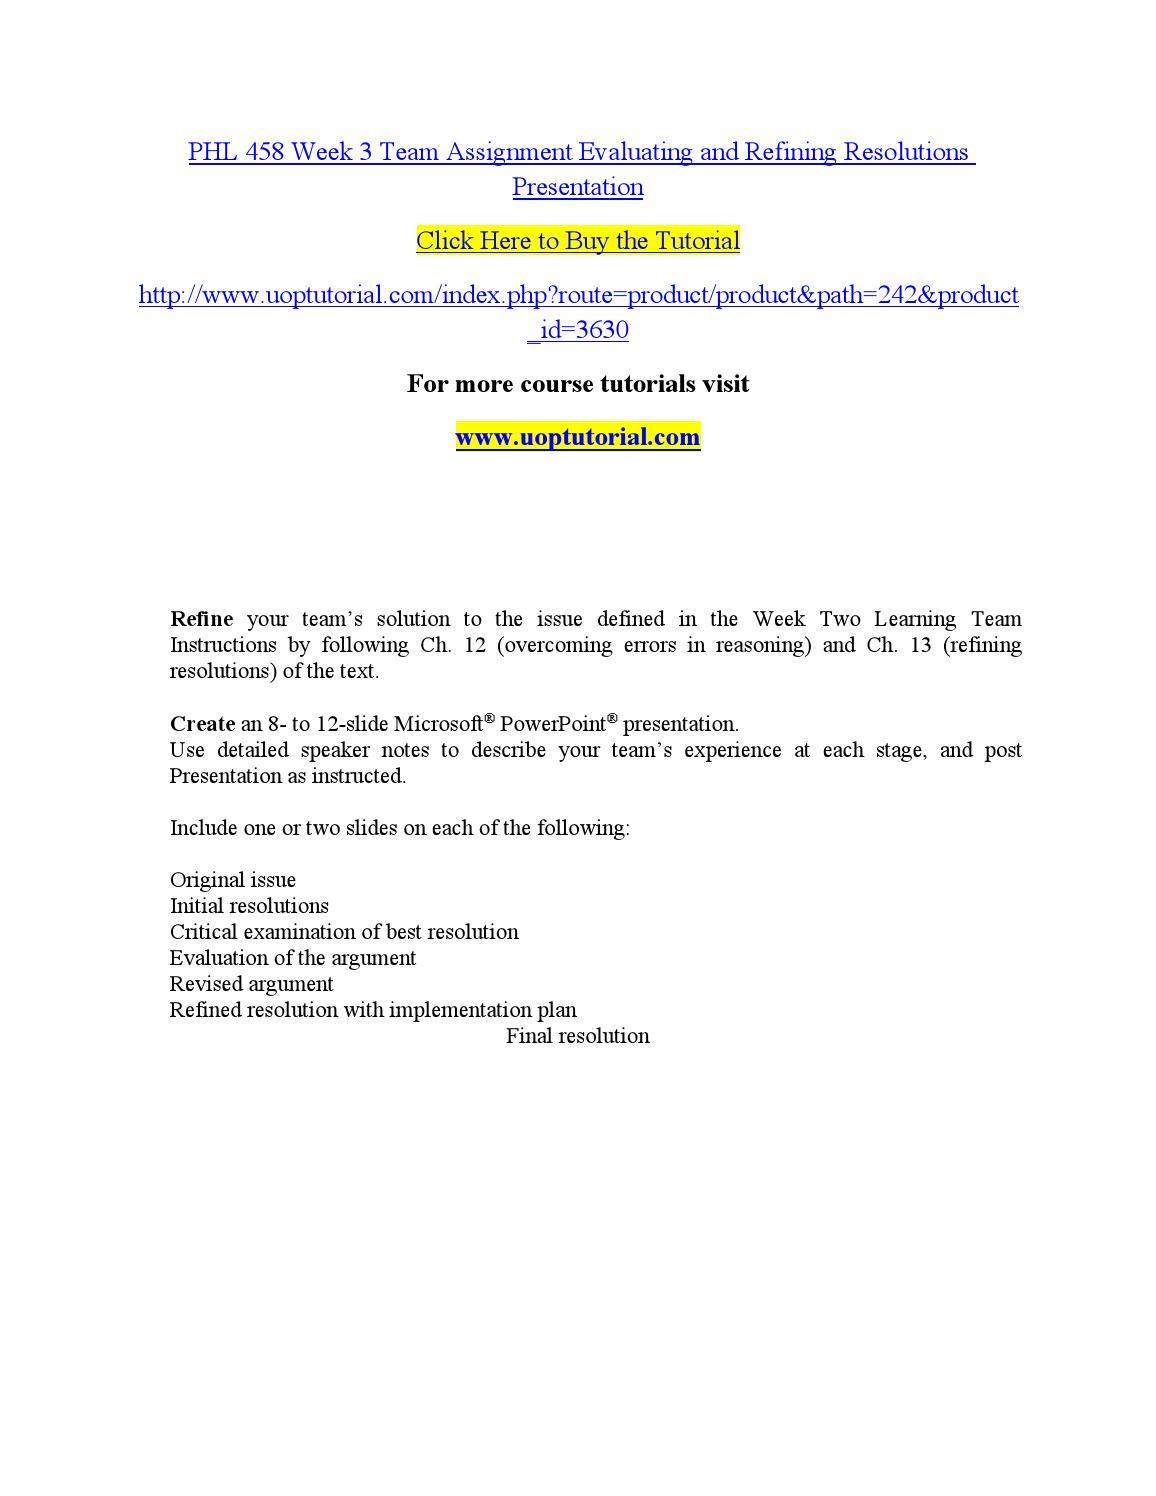 Phl 458 week 3 refining solution paper